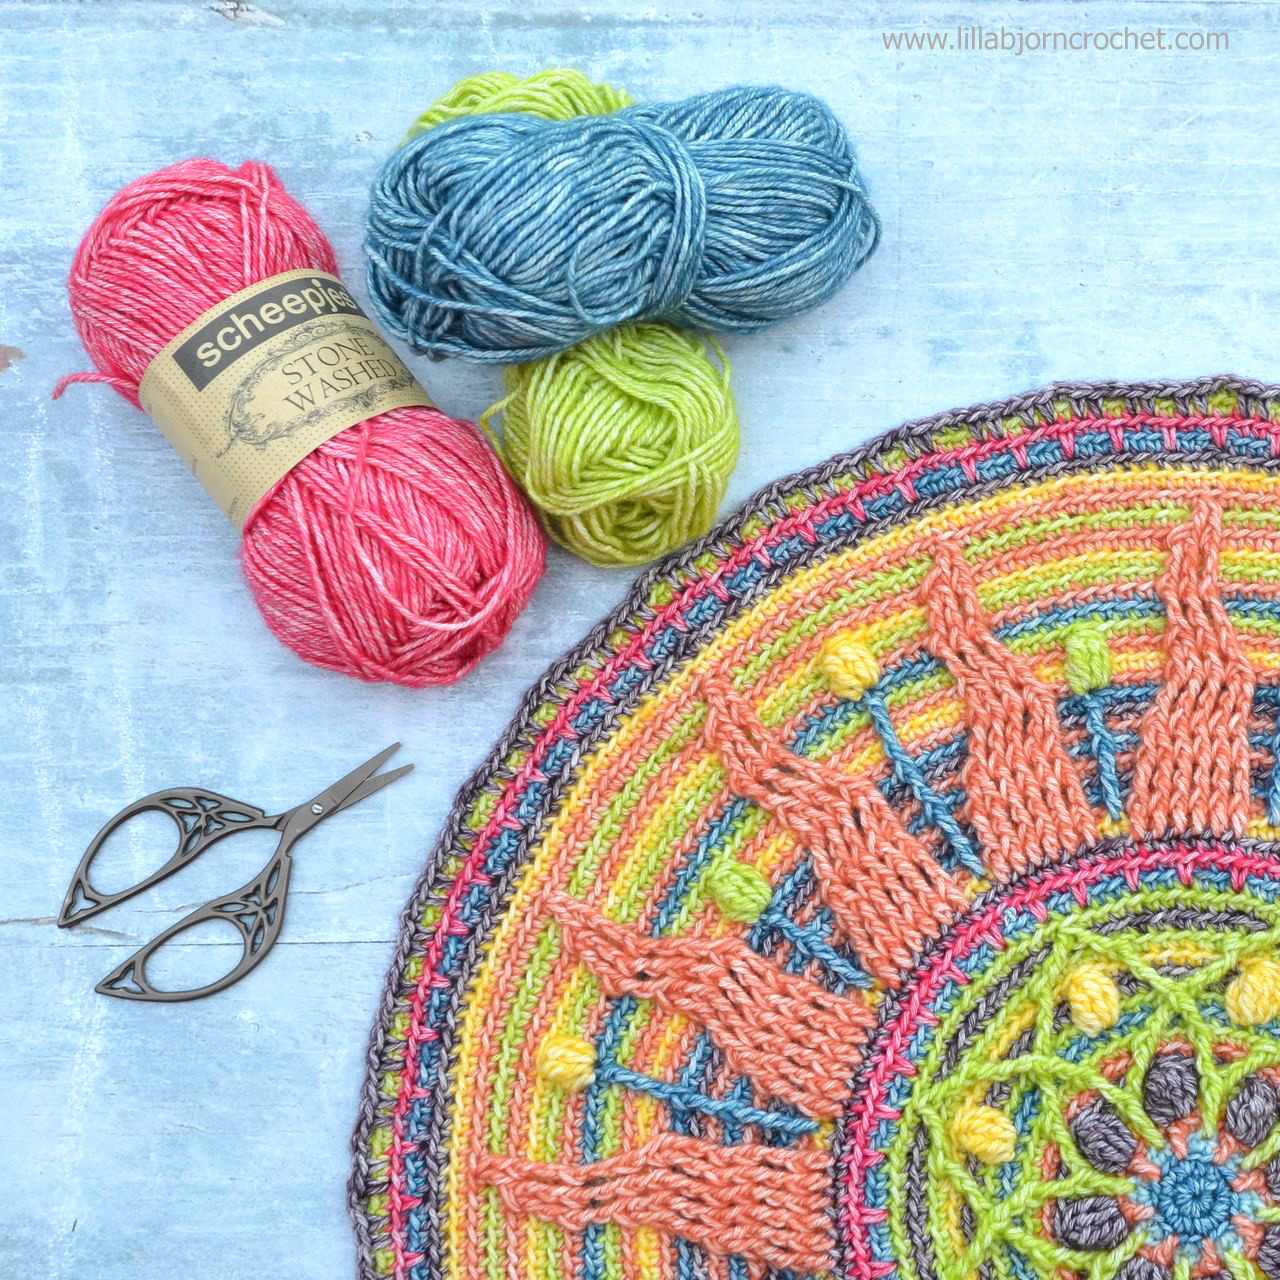 Sunny Mandala - overlay crochet pattern - original design by www.lillabjorncrochet.com